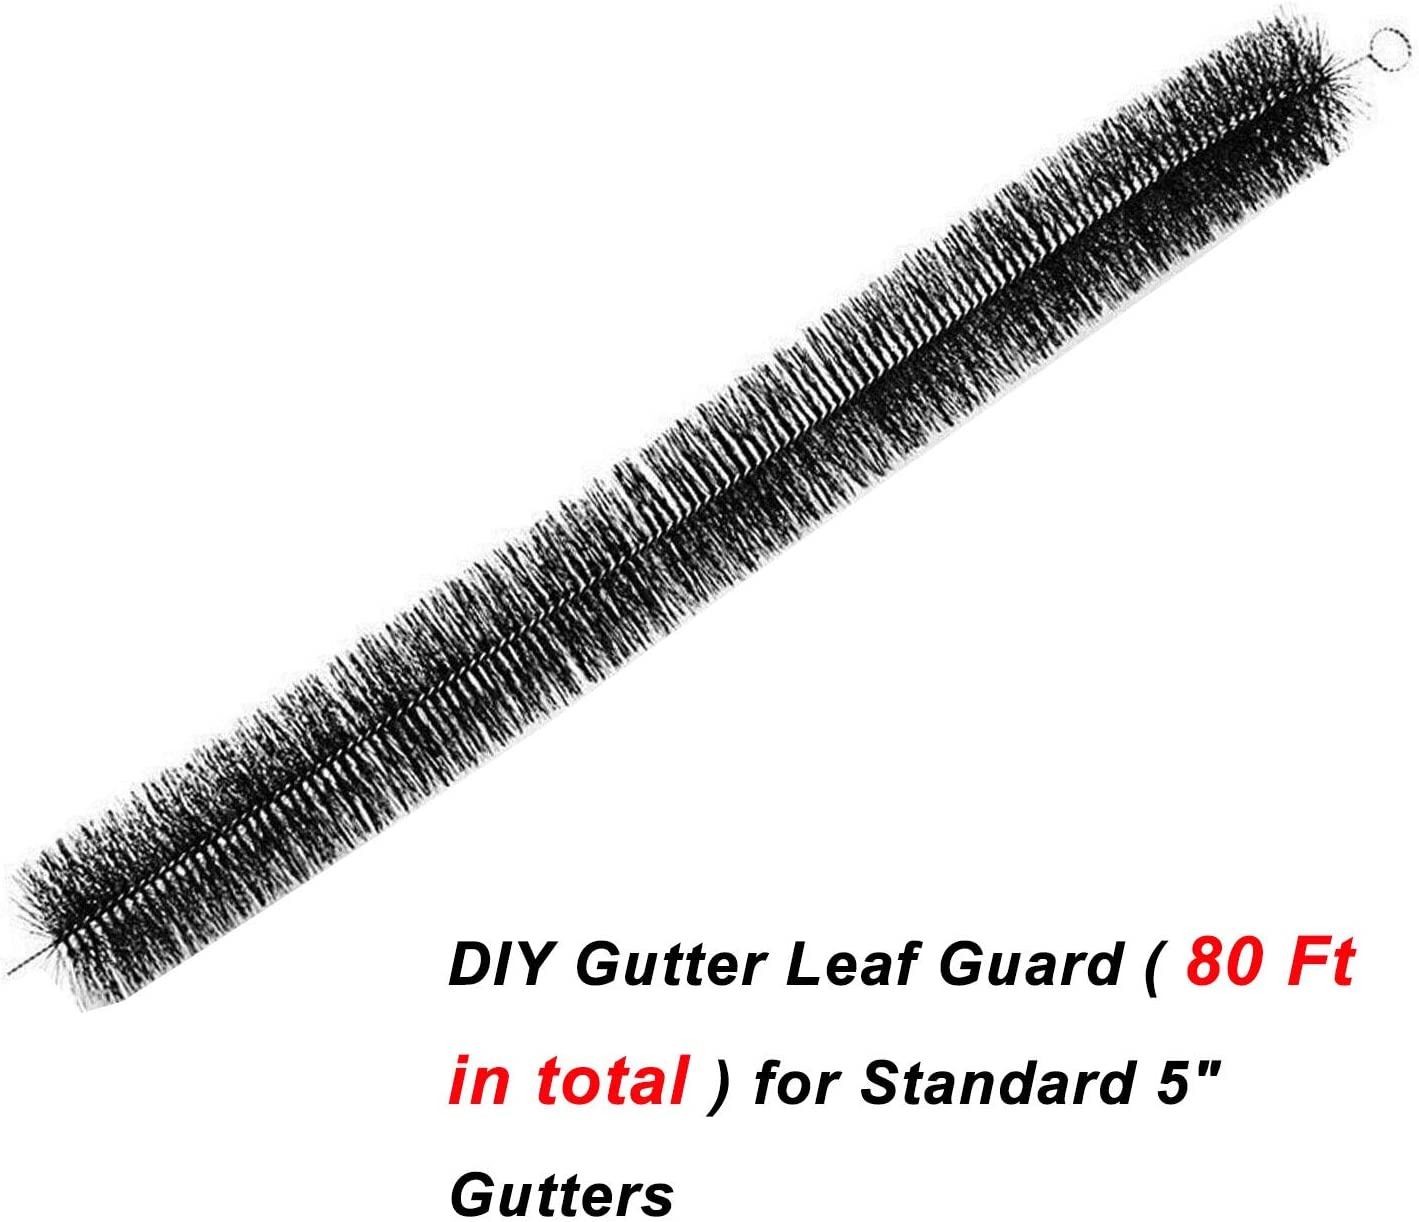 Simple For 4.5~5 Inch Gutter Brush Filter Leaf Debris Guard Gutter 100cm length Standard Gutter 4 Inch Brush guard 3.2ft x 25 80ft 25 Pcs